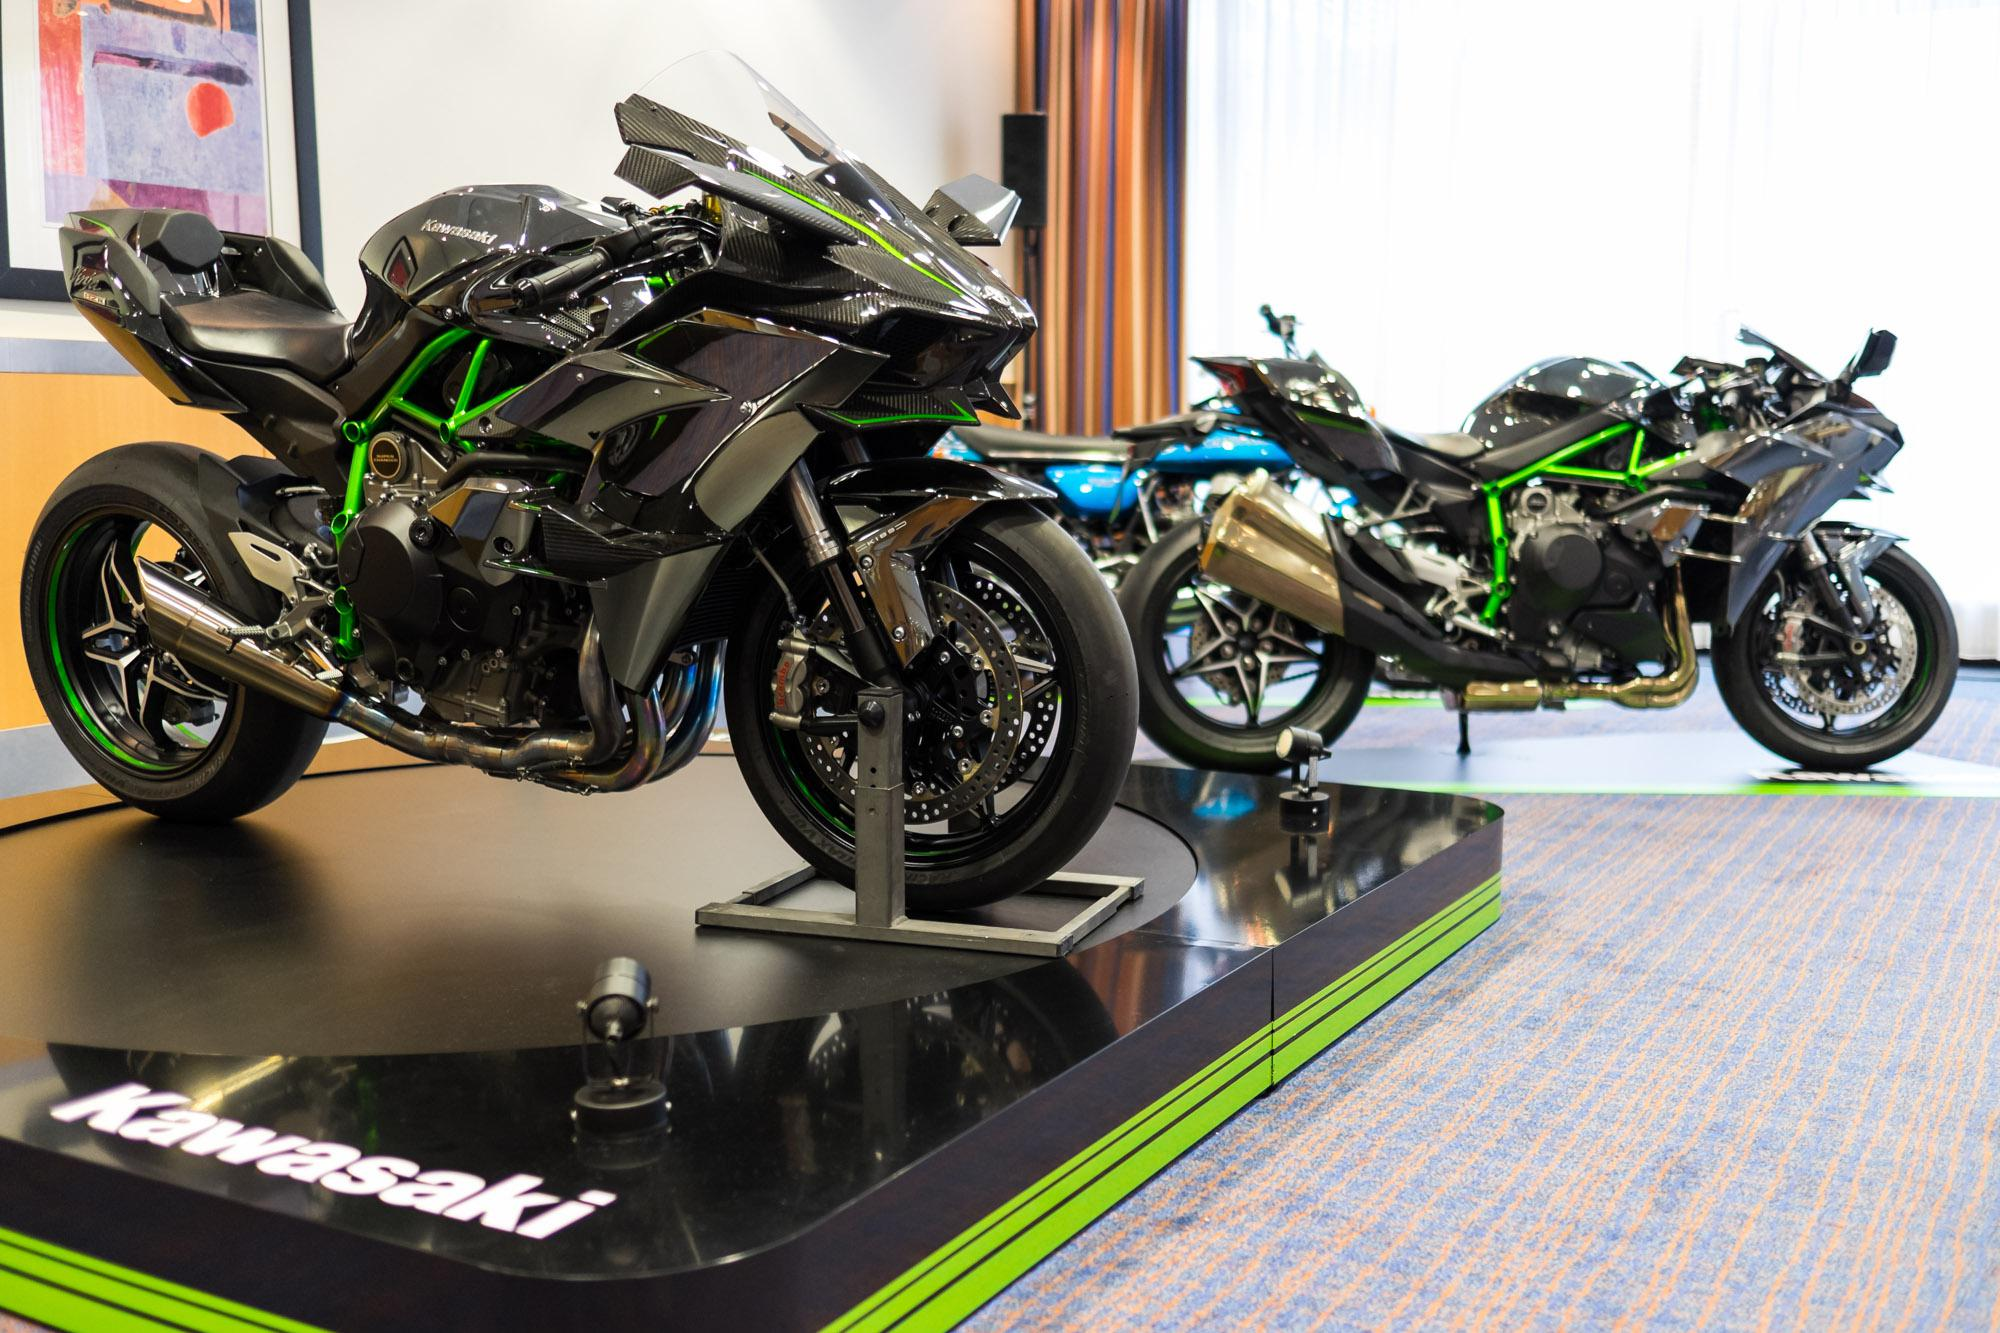 kawasaki ninja h2 und h2r premiere wien motorrad fotos. Black Bedroom Furniture Sets. Home Design Ideas